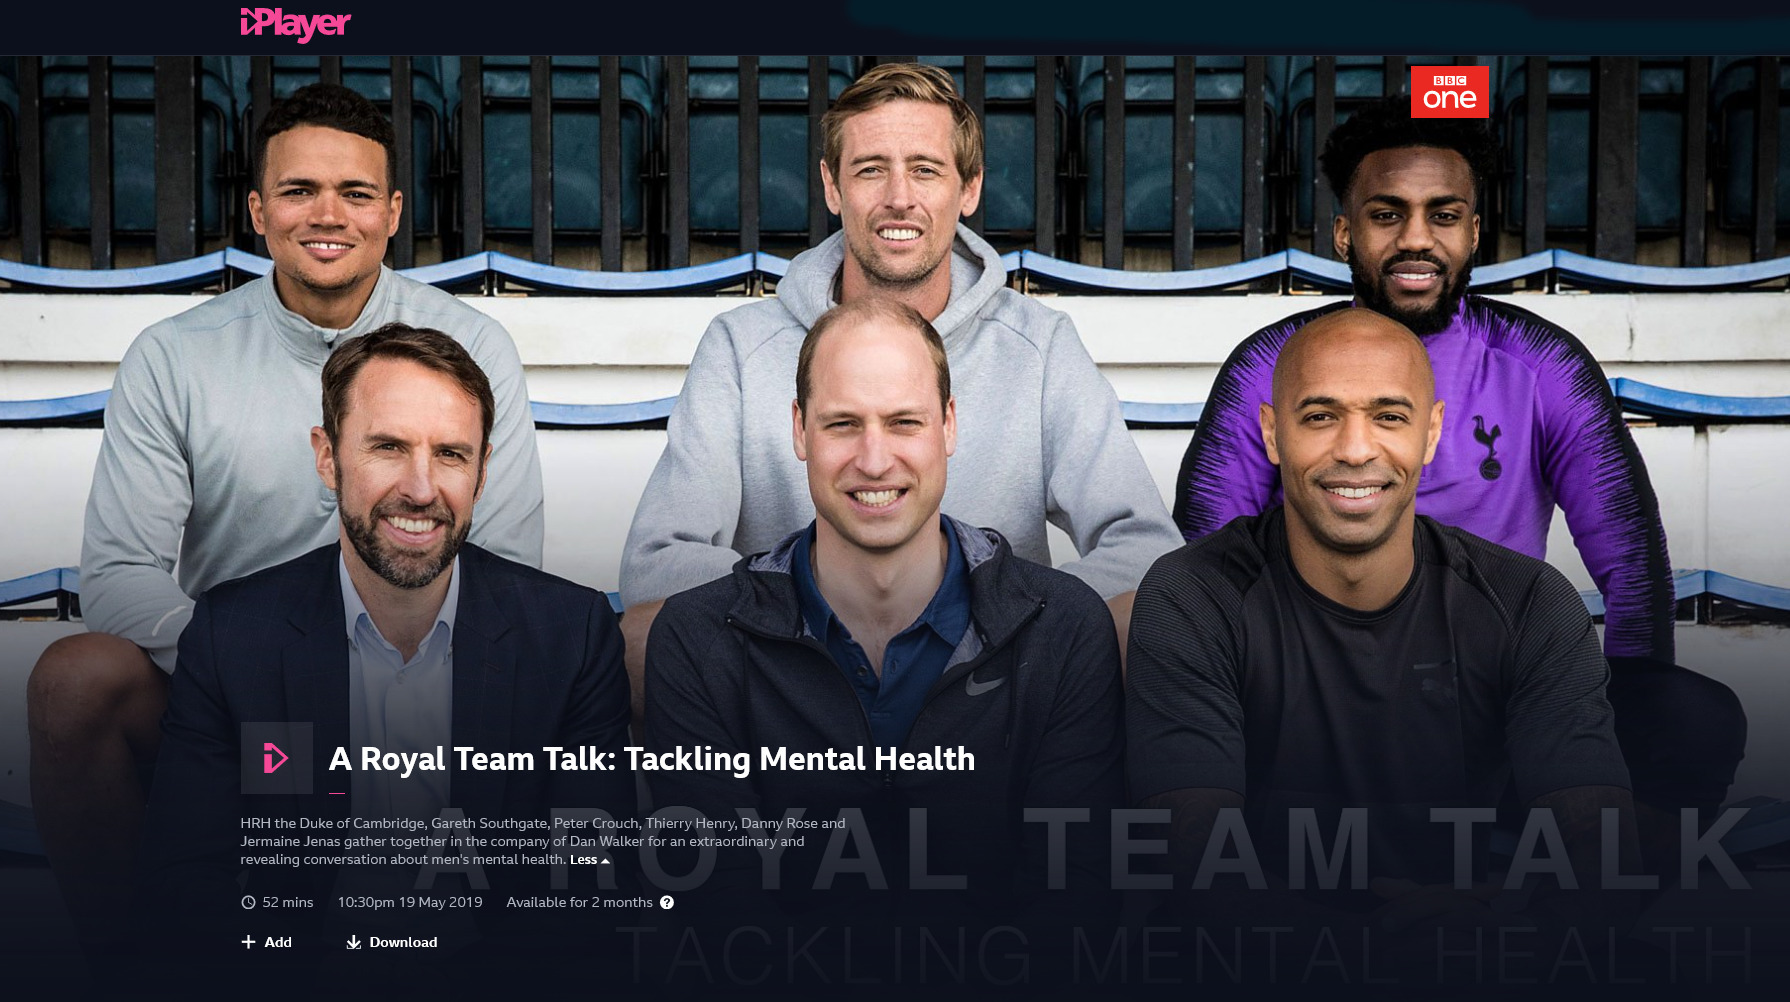 A Royal Team Talk: Tackling Mental Heath on BBC iPlayer